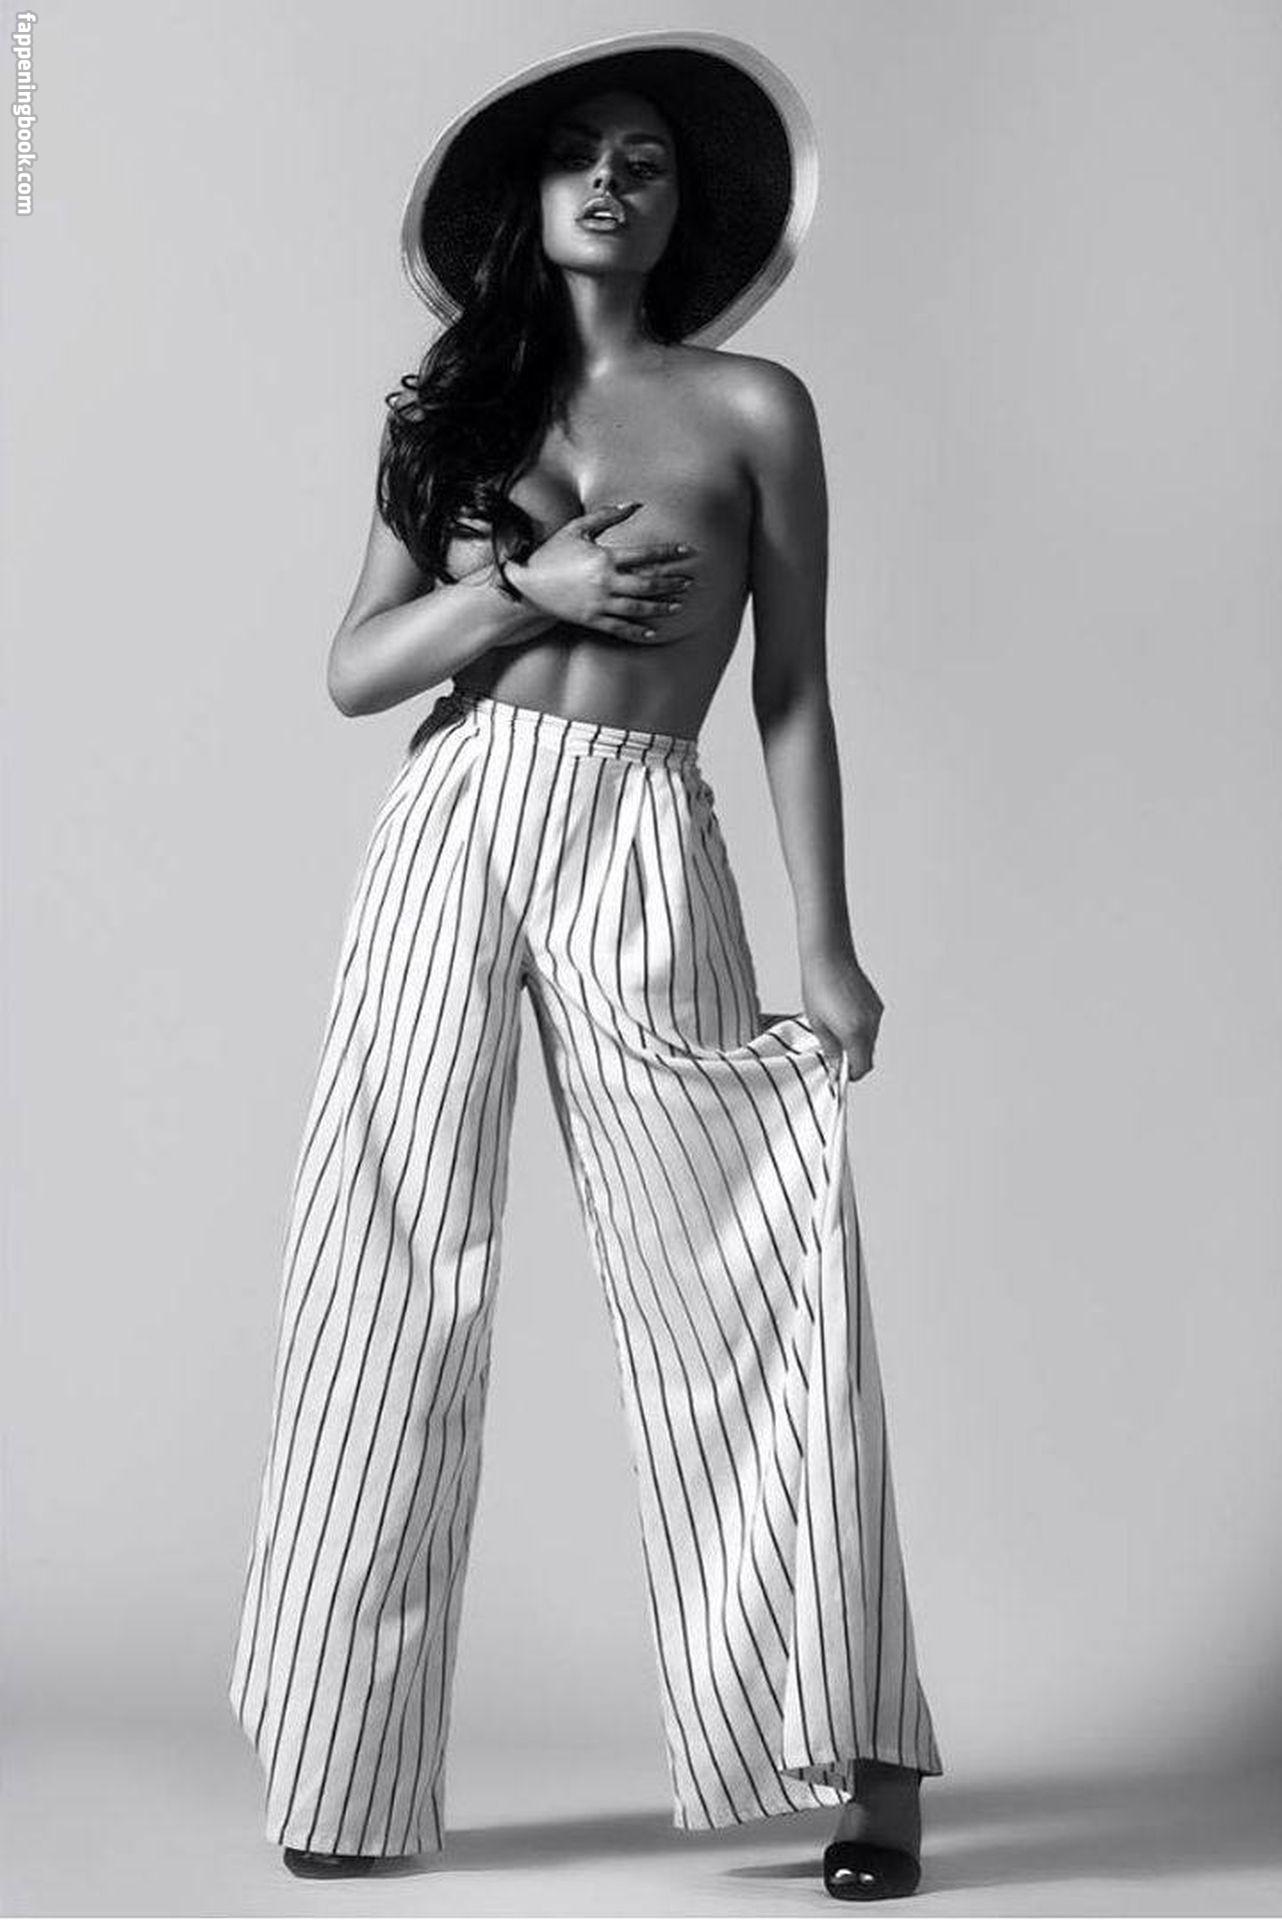 Beyoncé Sexy (12 Photos)_5d20c7ae8250c.jpeg | Pics Holder